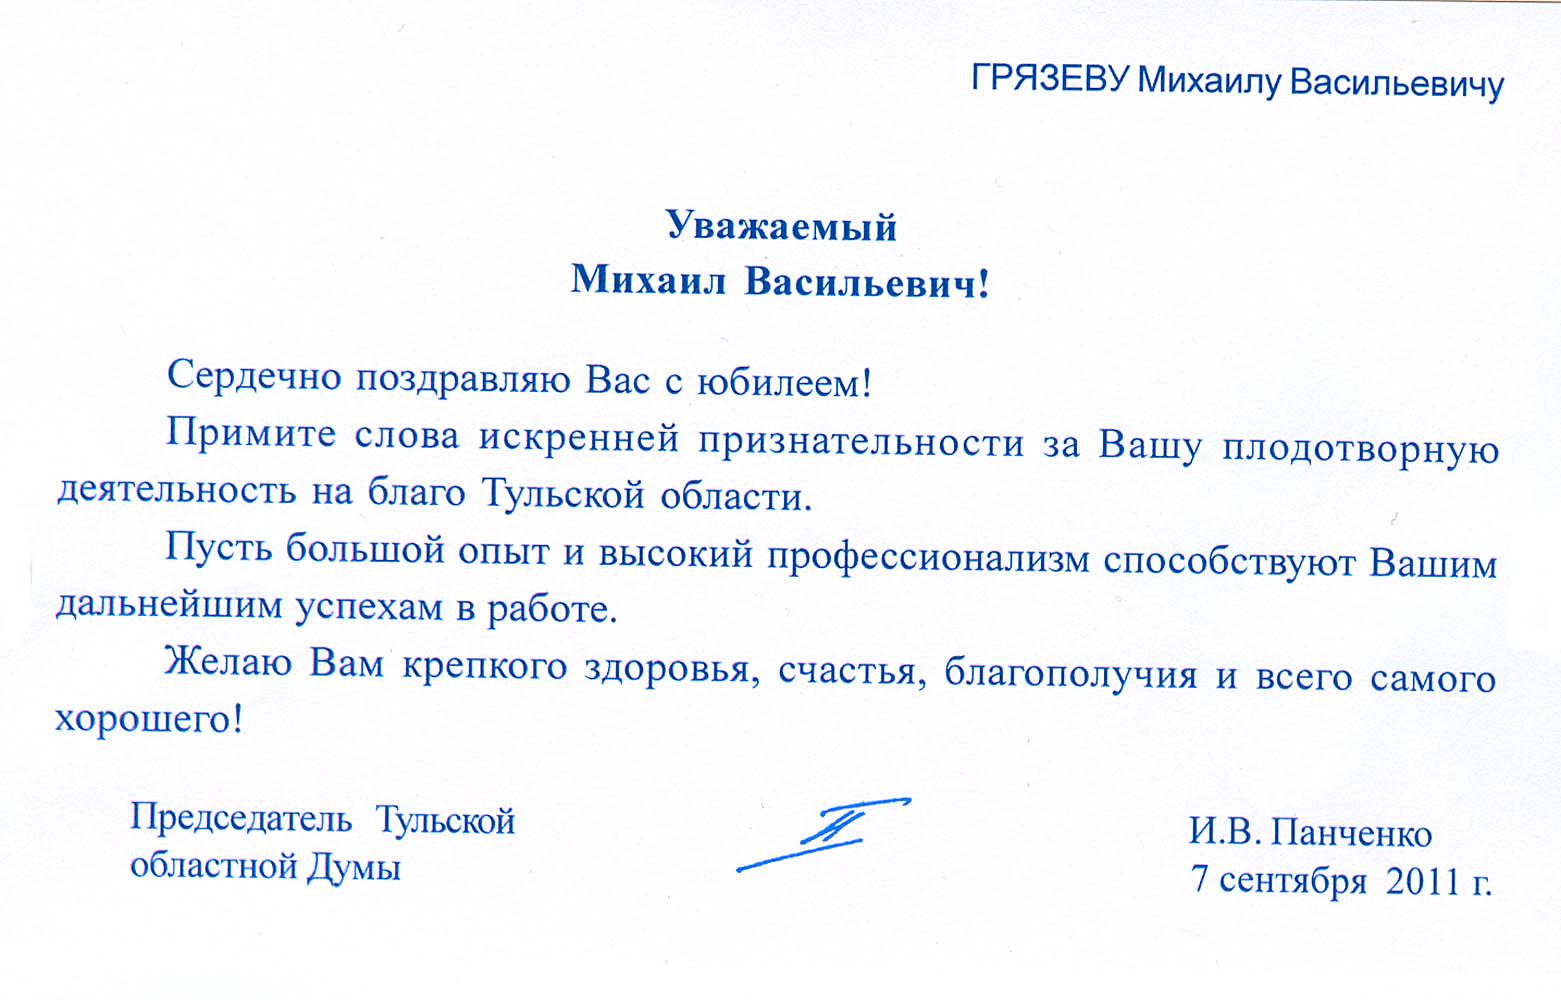 Поздравления с днем рождения председателю суда от губернатора